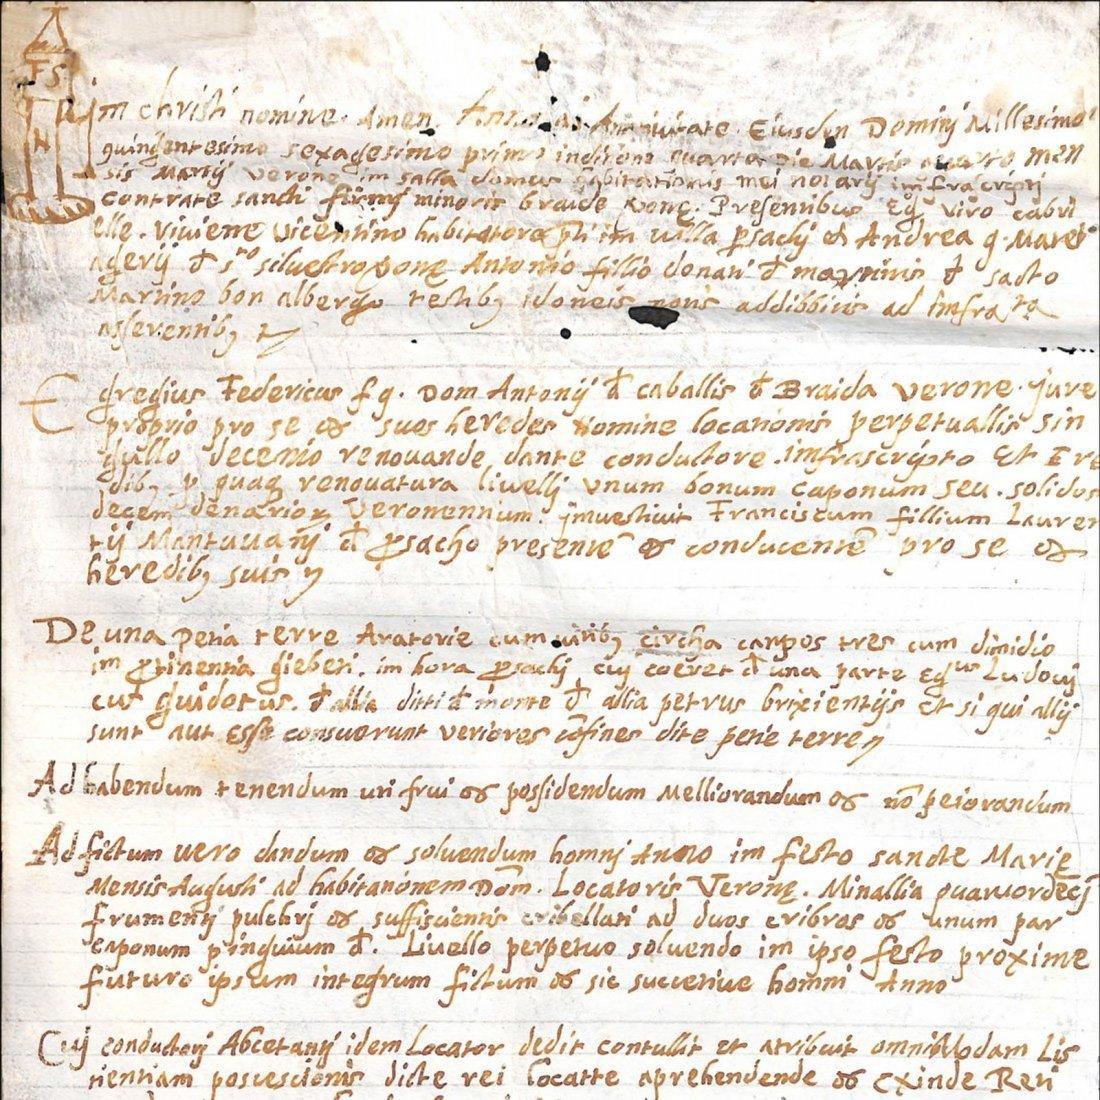 [Manuscripts] Ms on vellum 4 marzo 1561